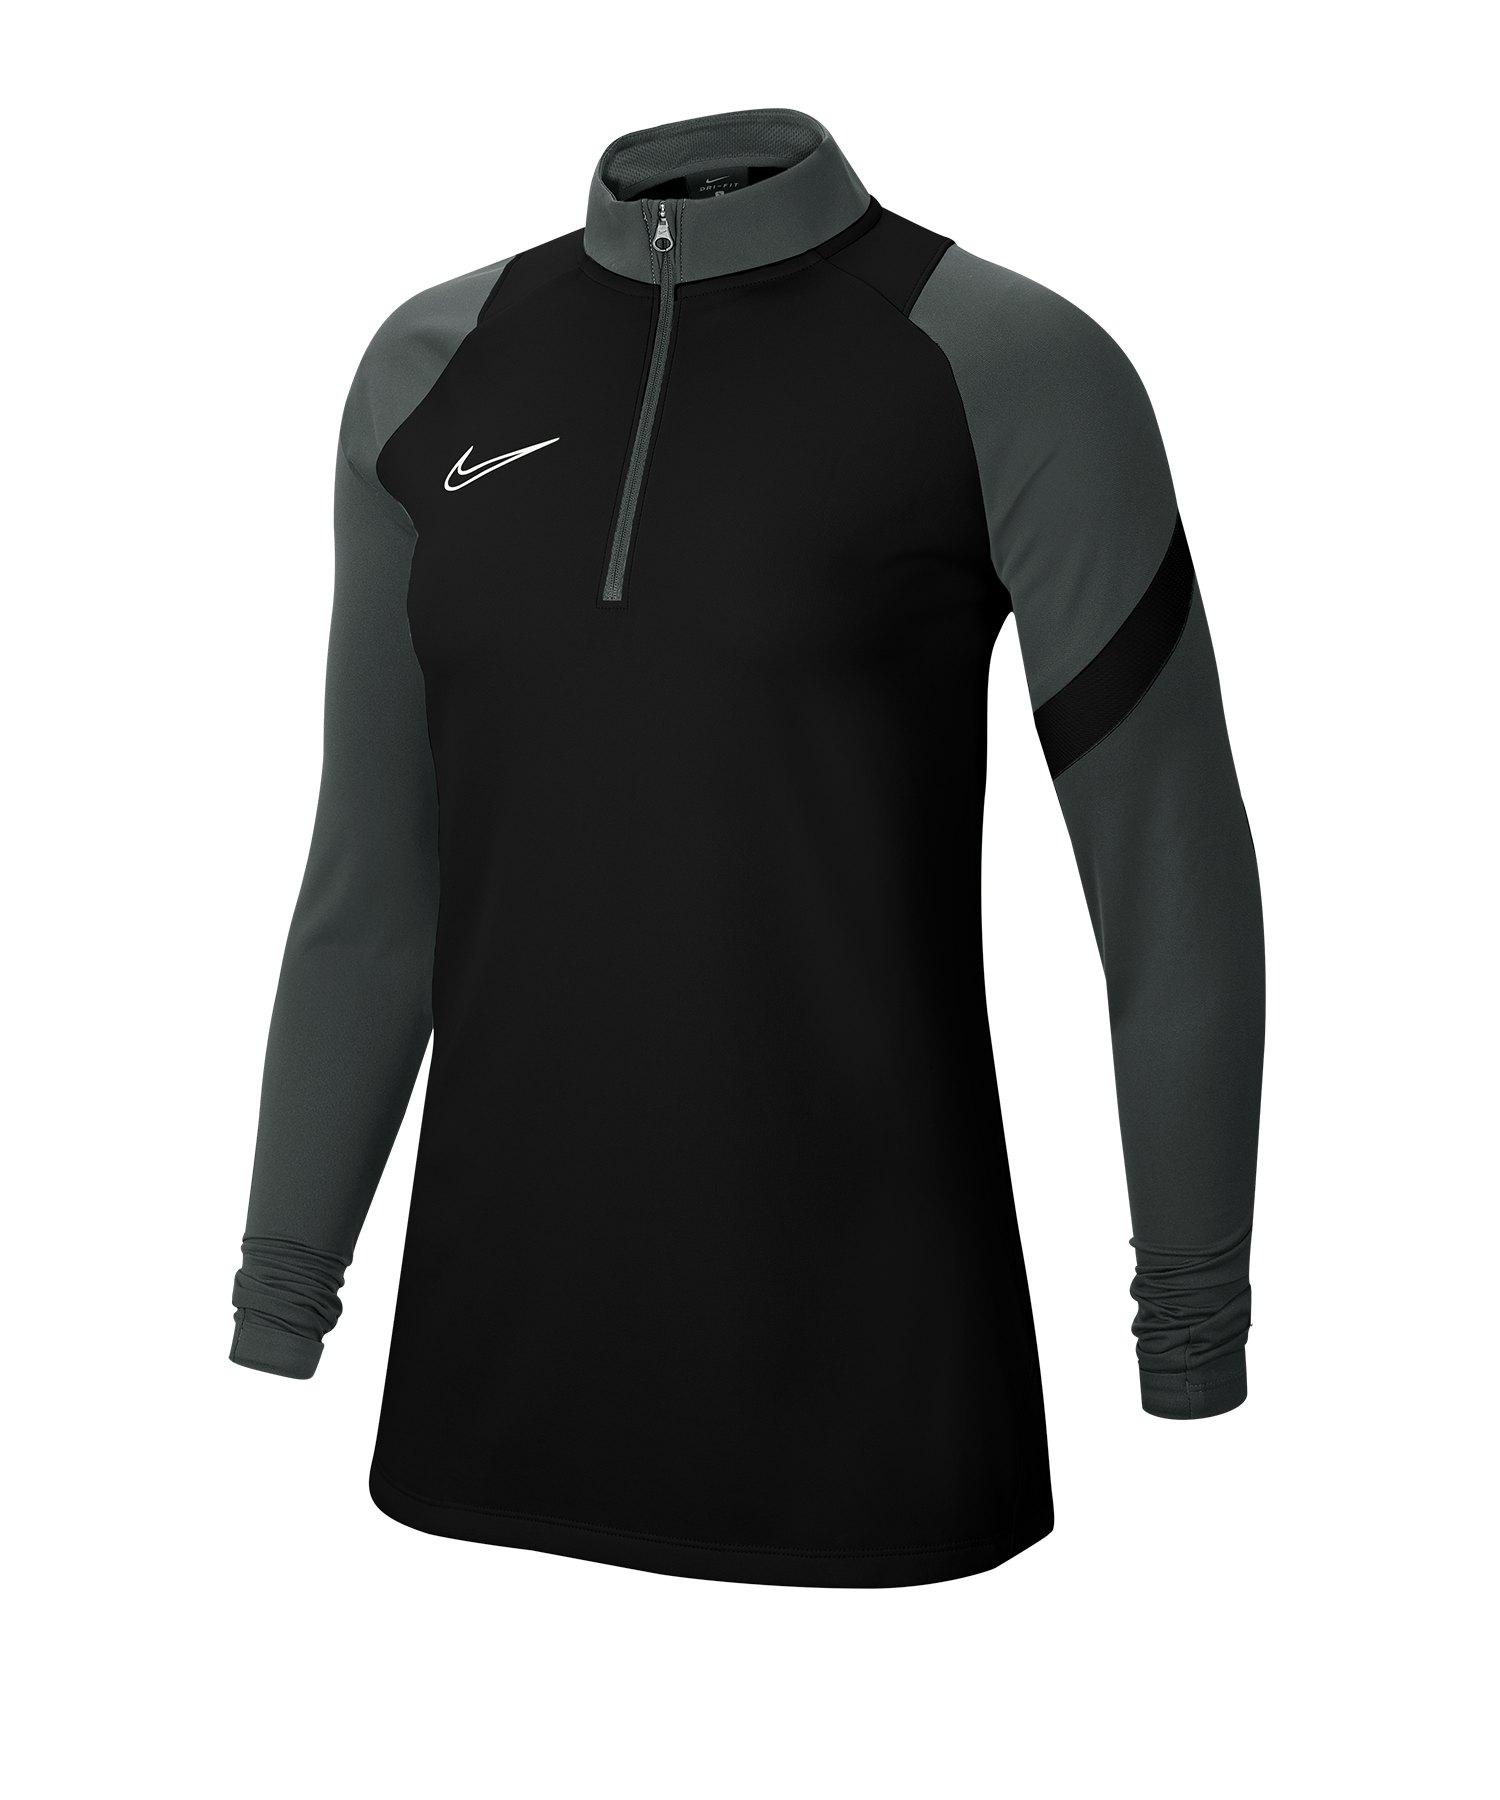 Nike Academy Pro Sweatshirt Damen Schwarz F011 - schwarz